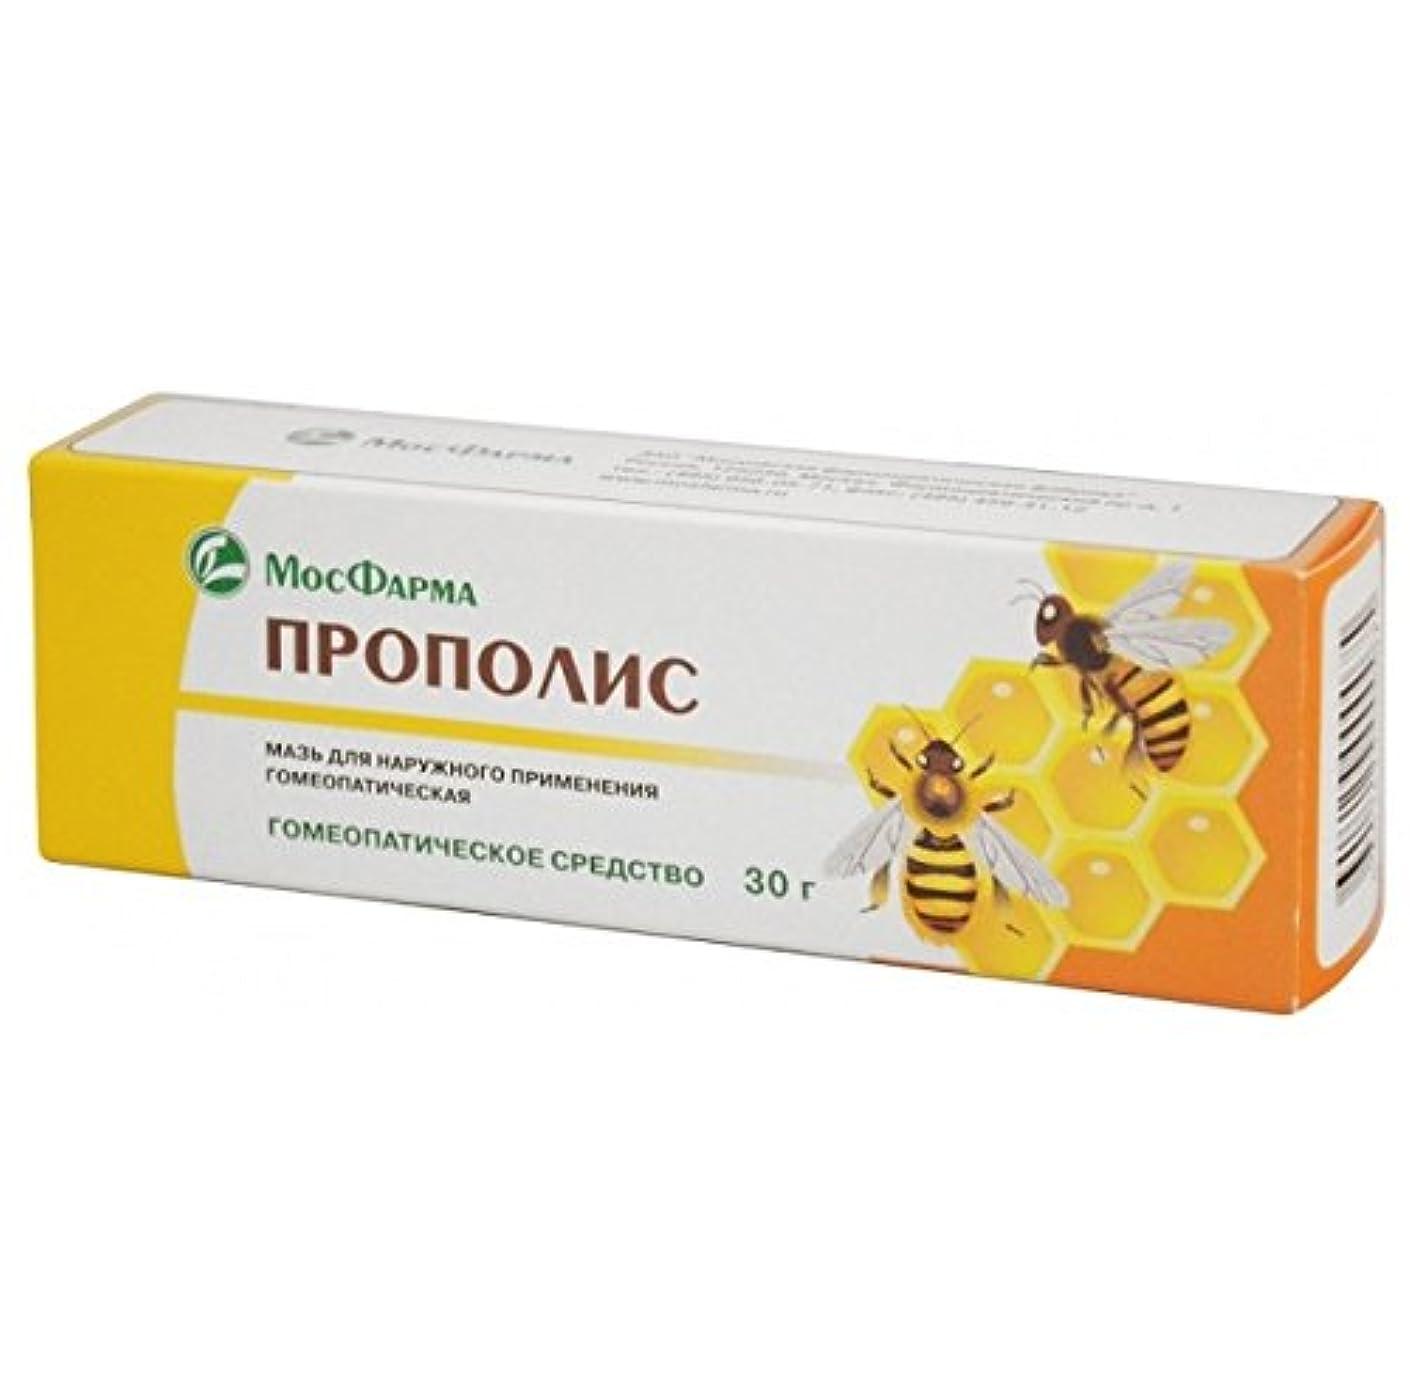 Propolis ointment 30gr. プロポリス軟膏